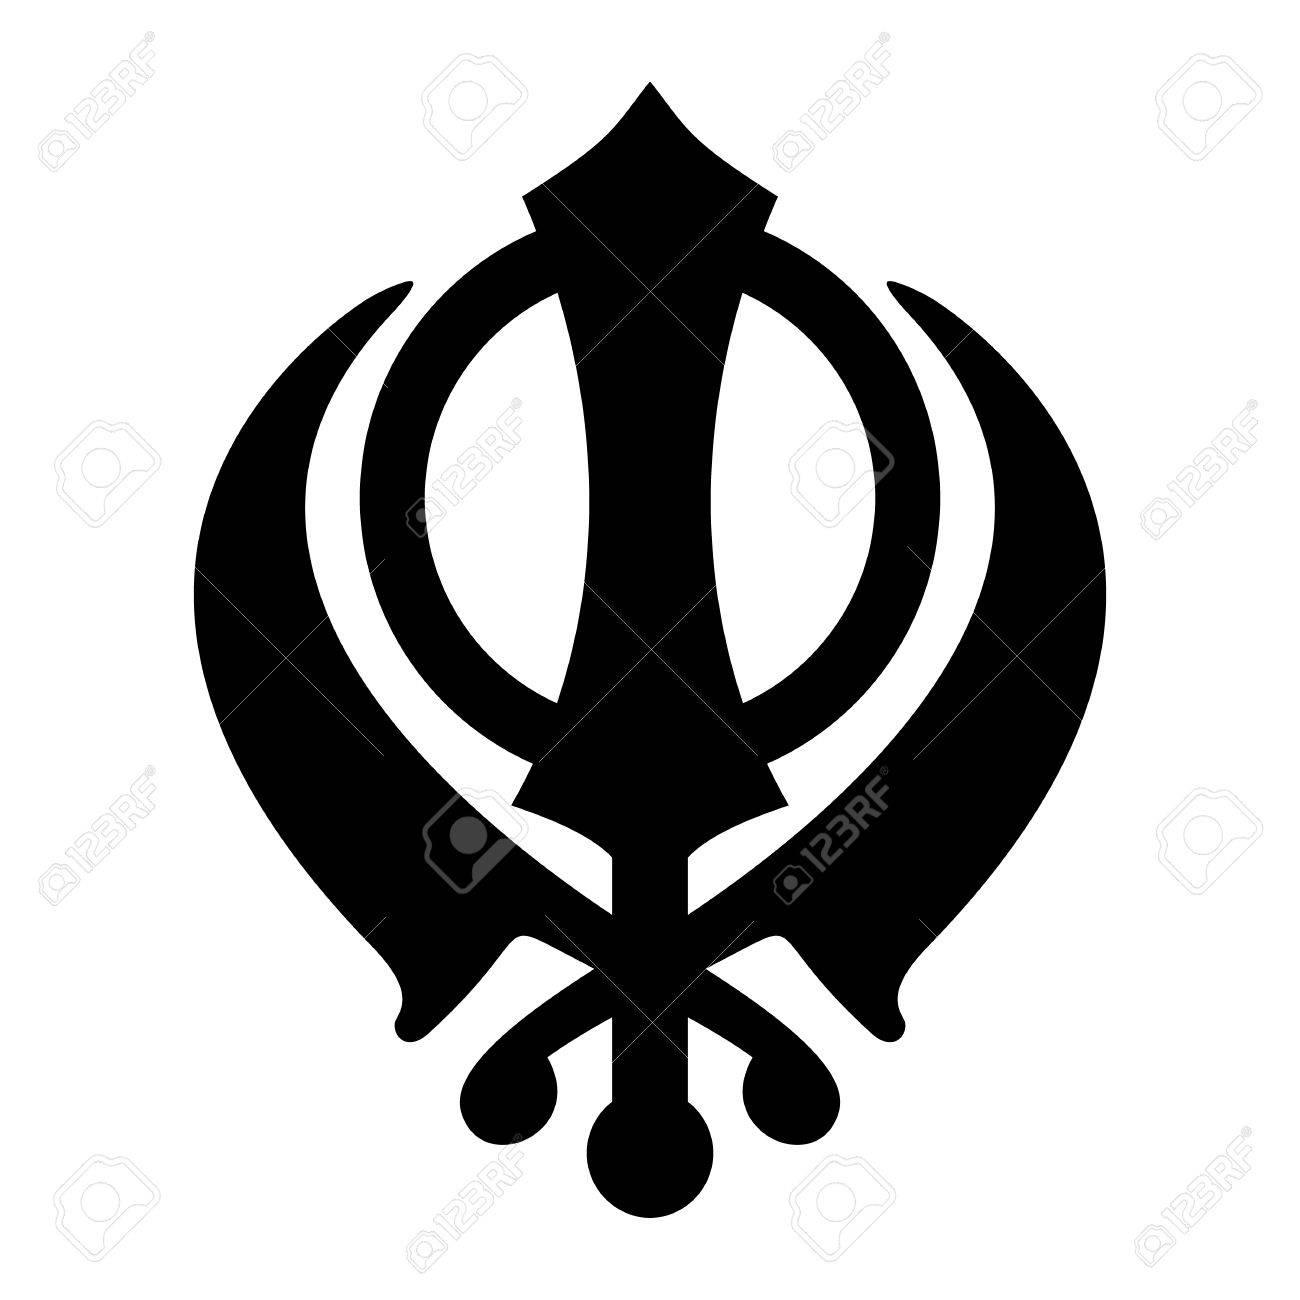 Khanda Sikh icon isolated on white background. Black silhouette. Religious  symbol. Vector illustration